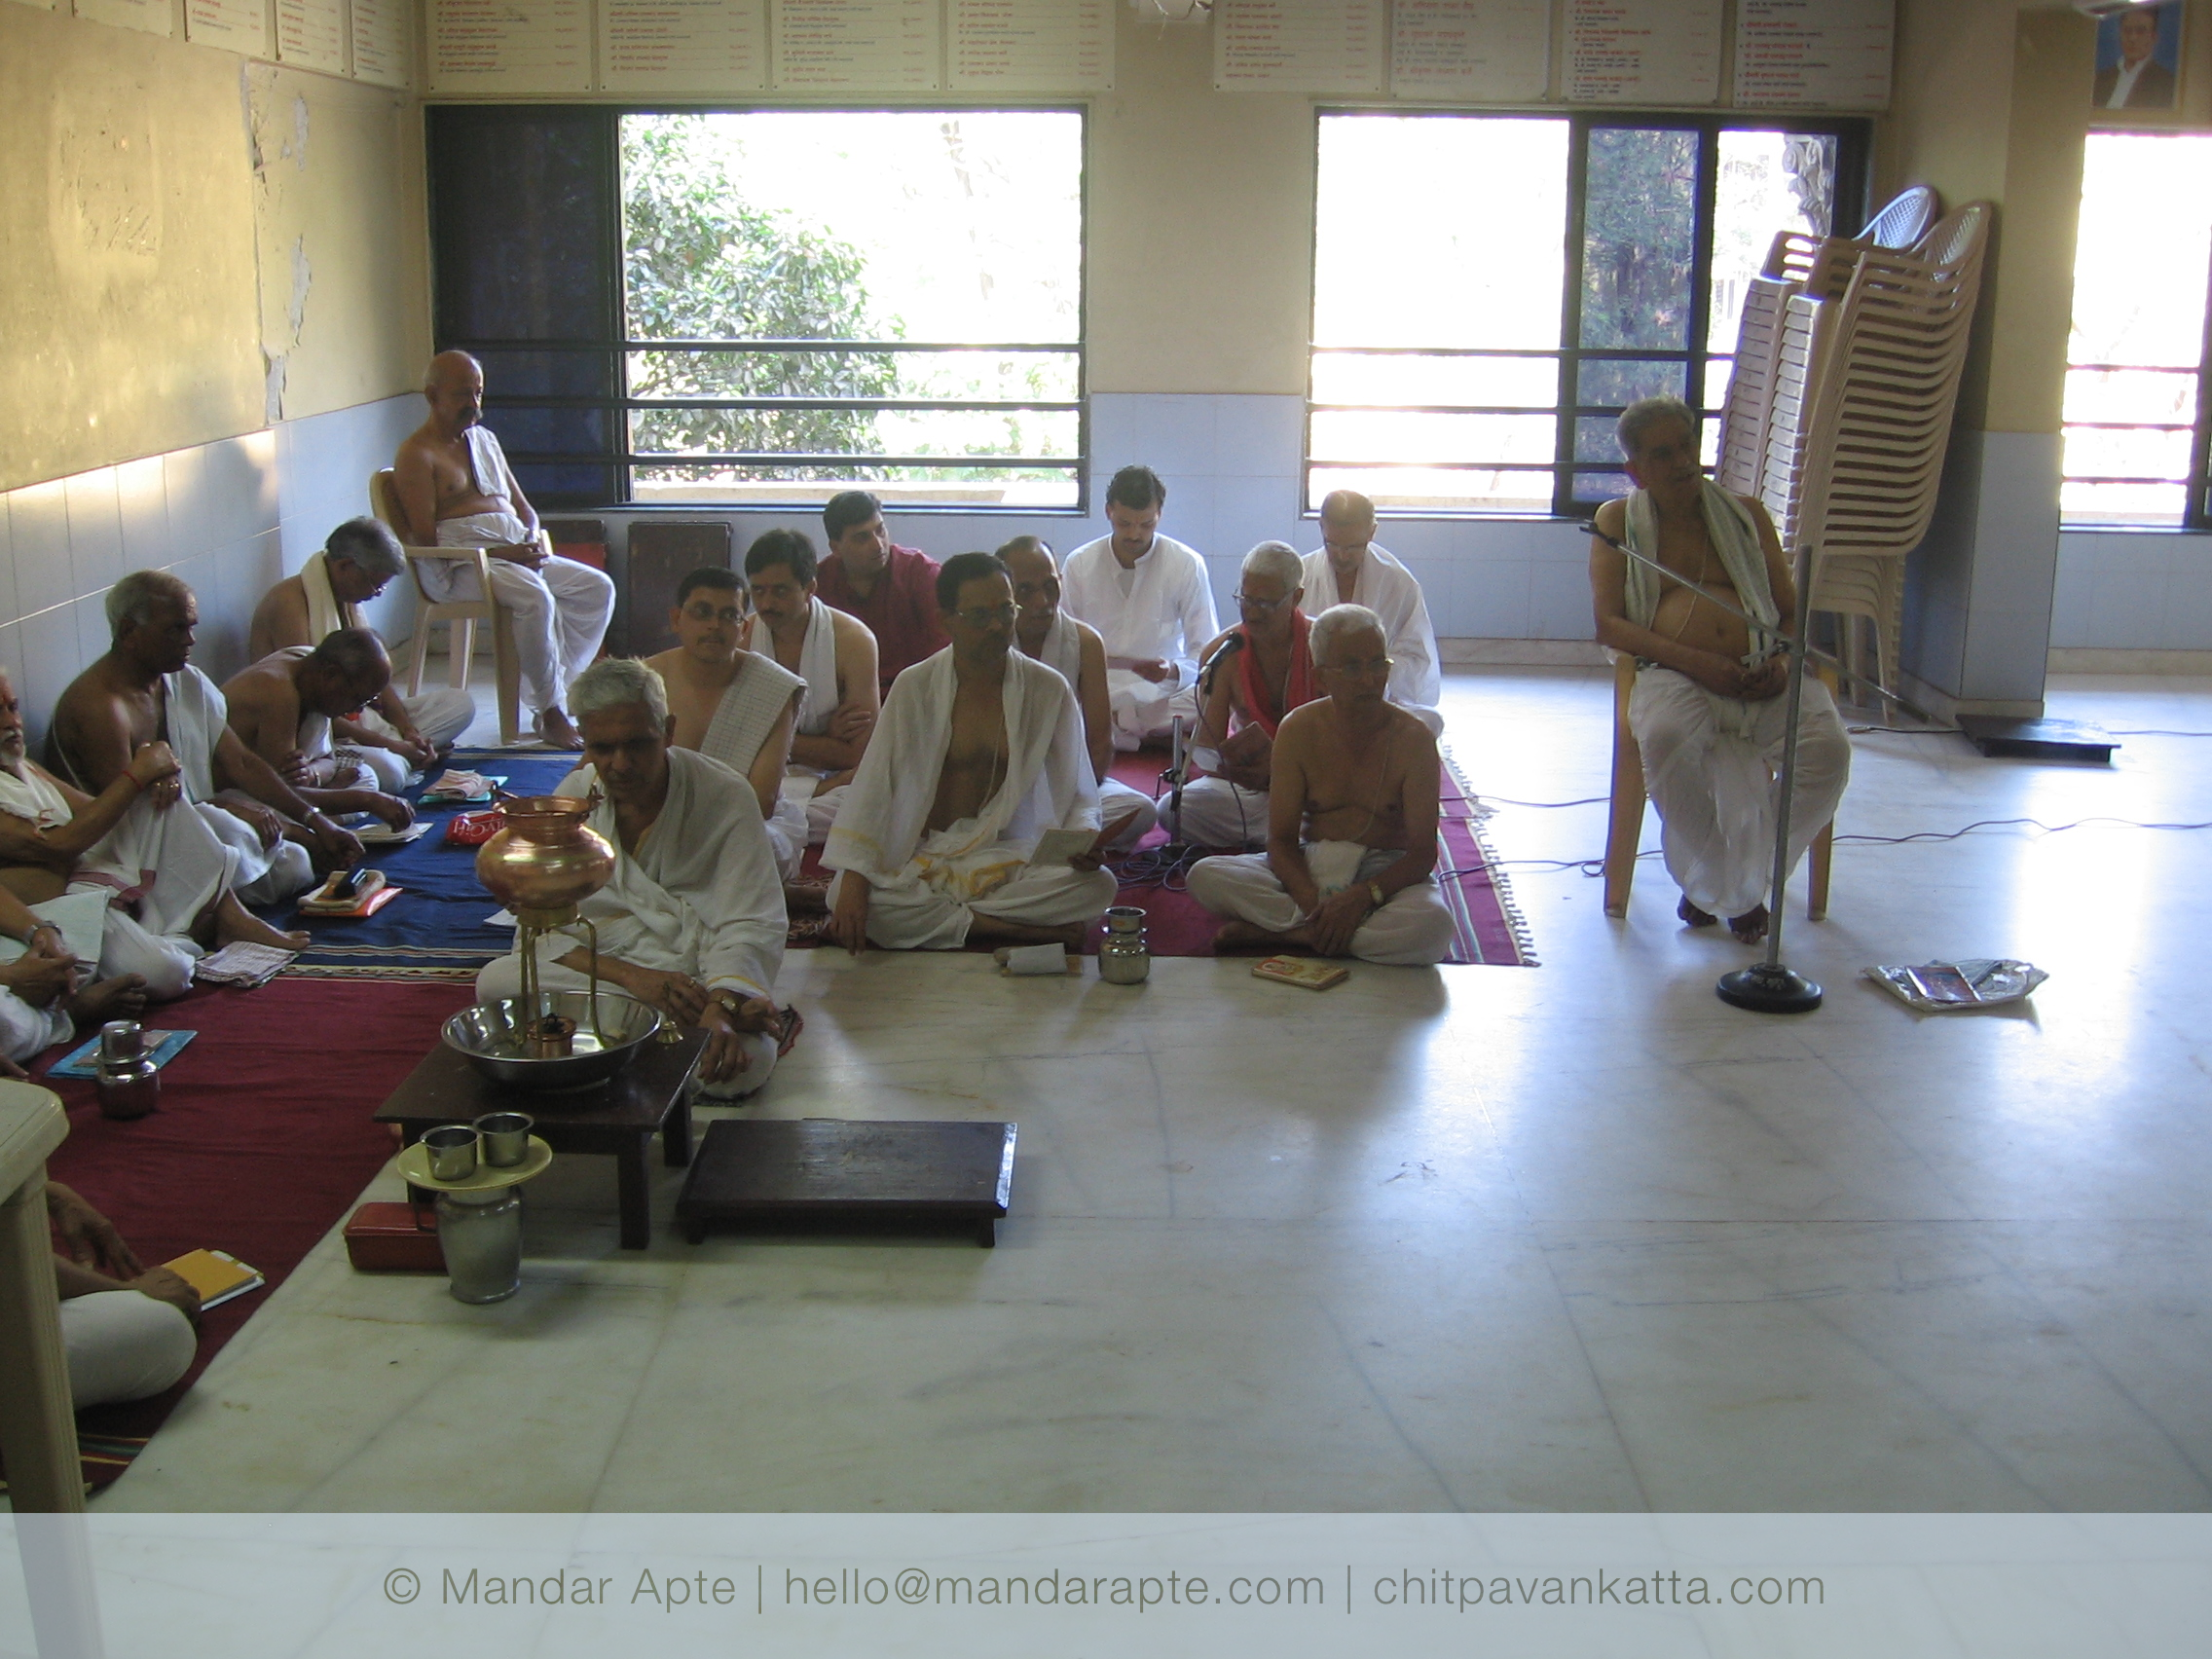 Mahashivaratri at Chitpavan Sangha Mulund 10th March 2013 07